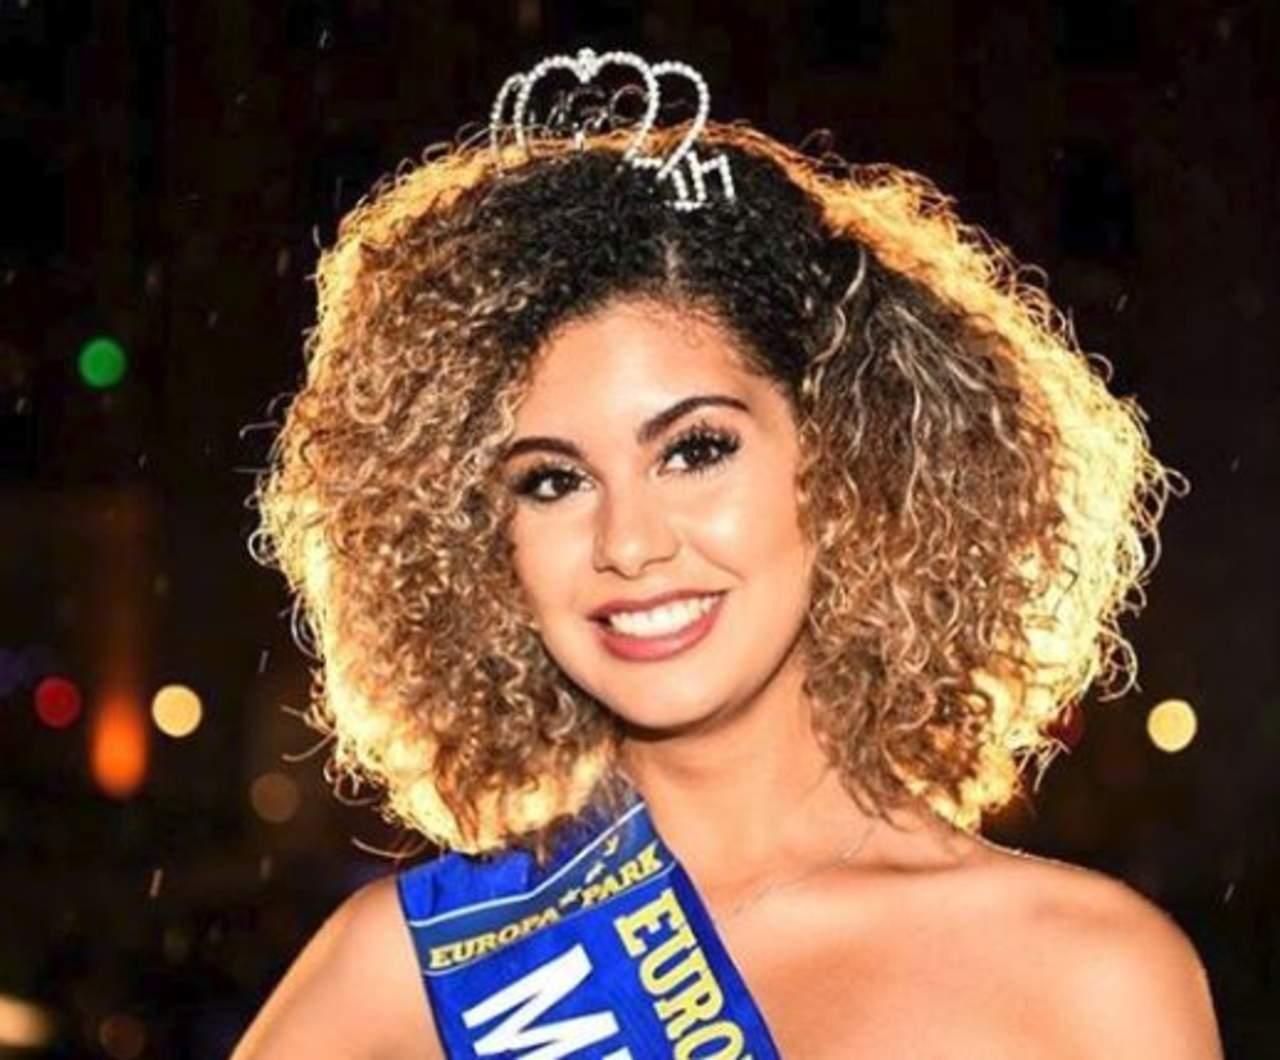 Zoé Brunet es la ganadora de Miss Mundial 2018